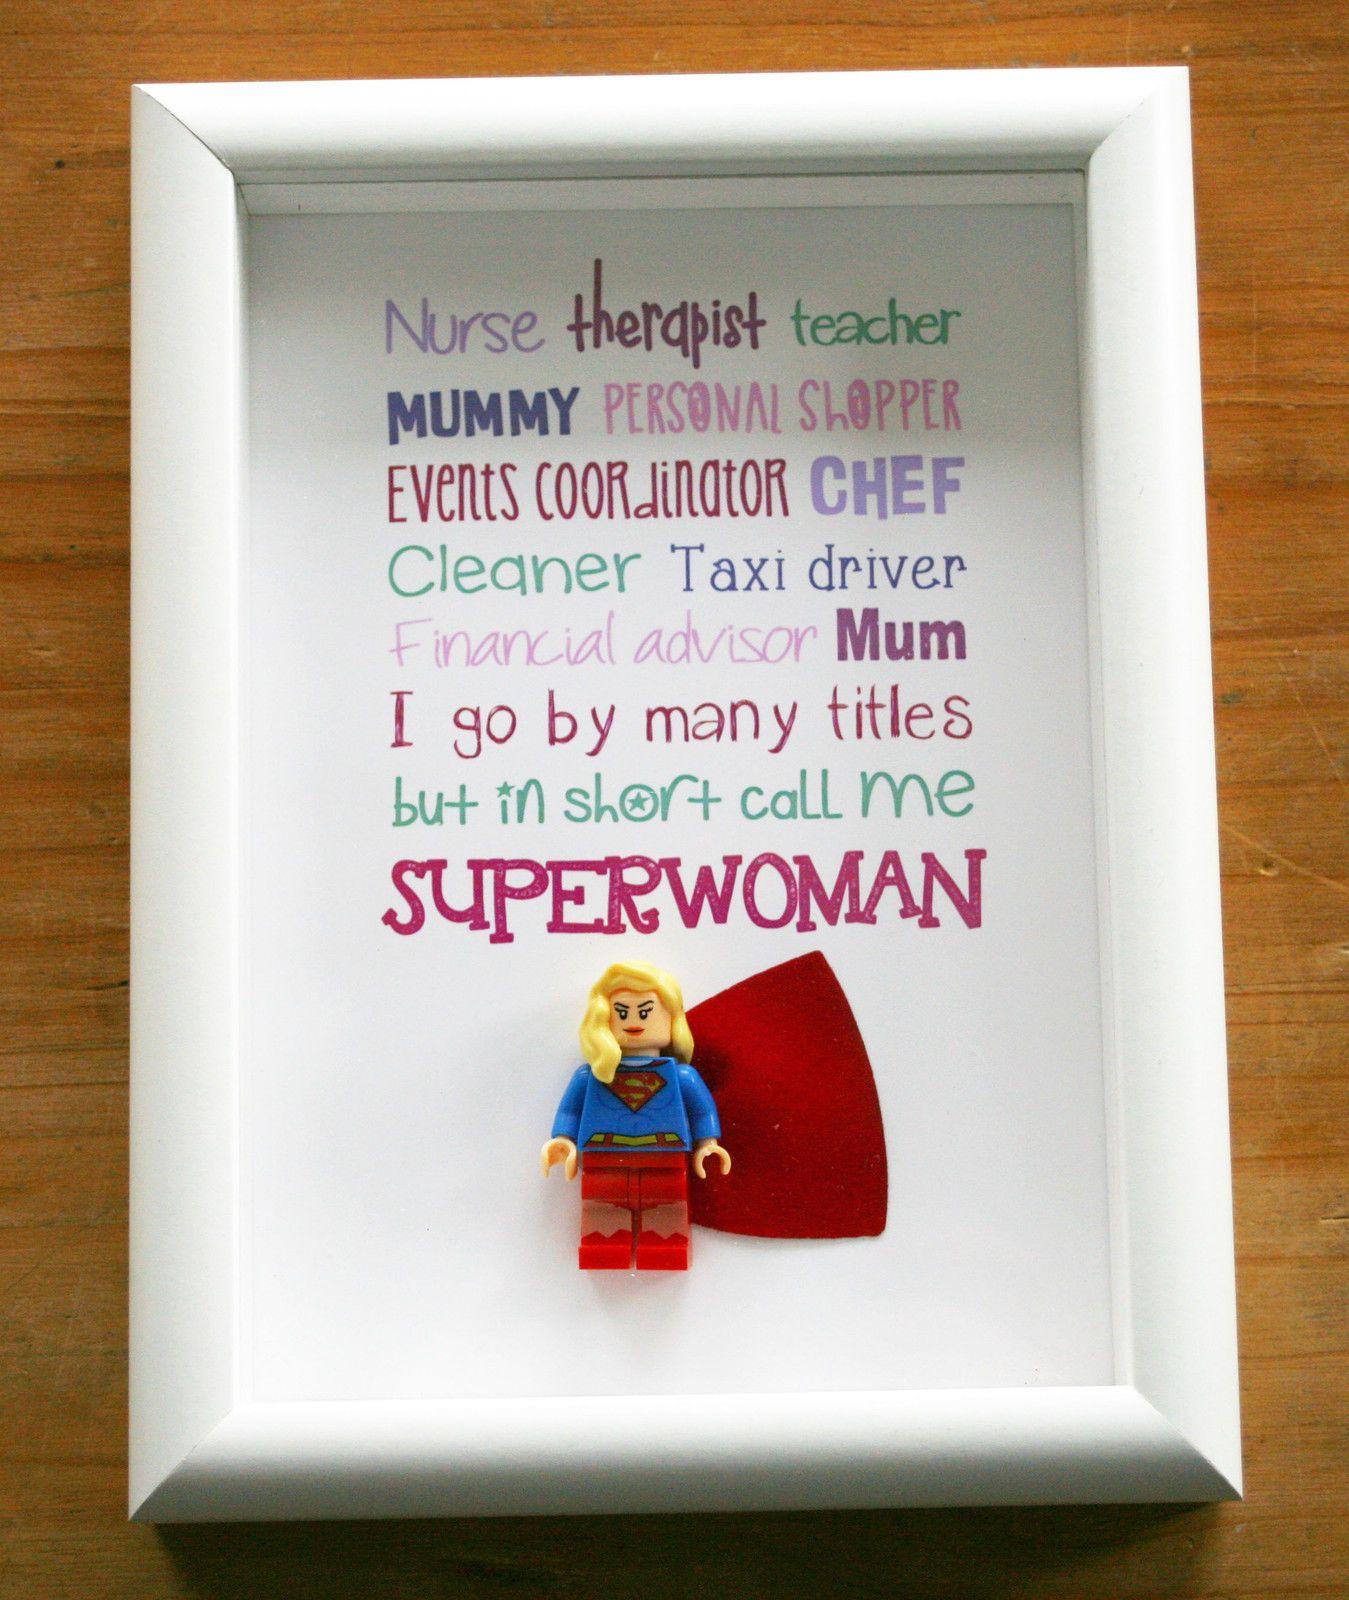 Birthday Present Mum Sister Job Descriptions Of A Mother Superwoman Lego Frame